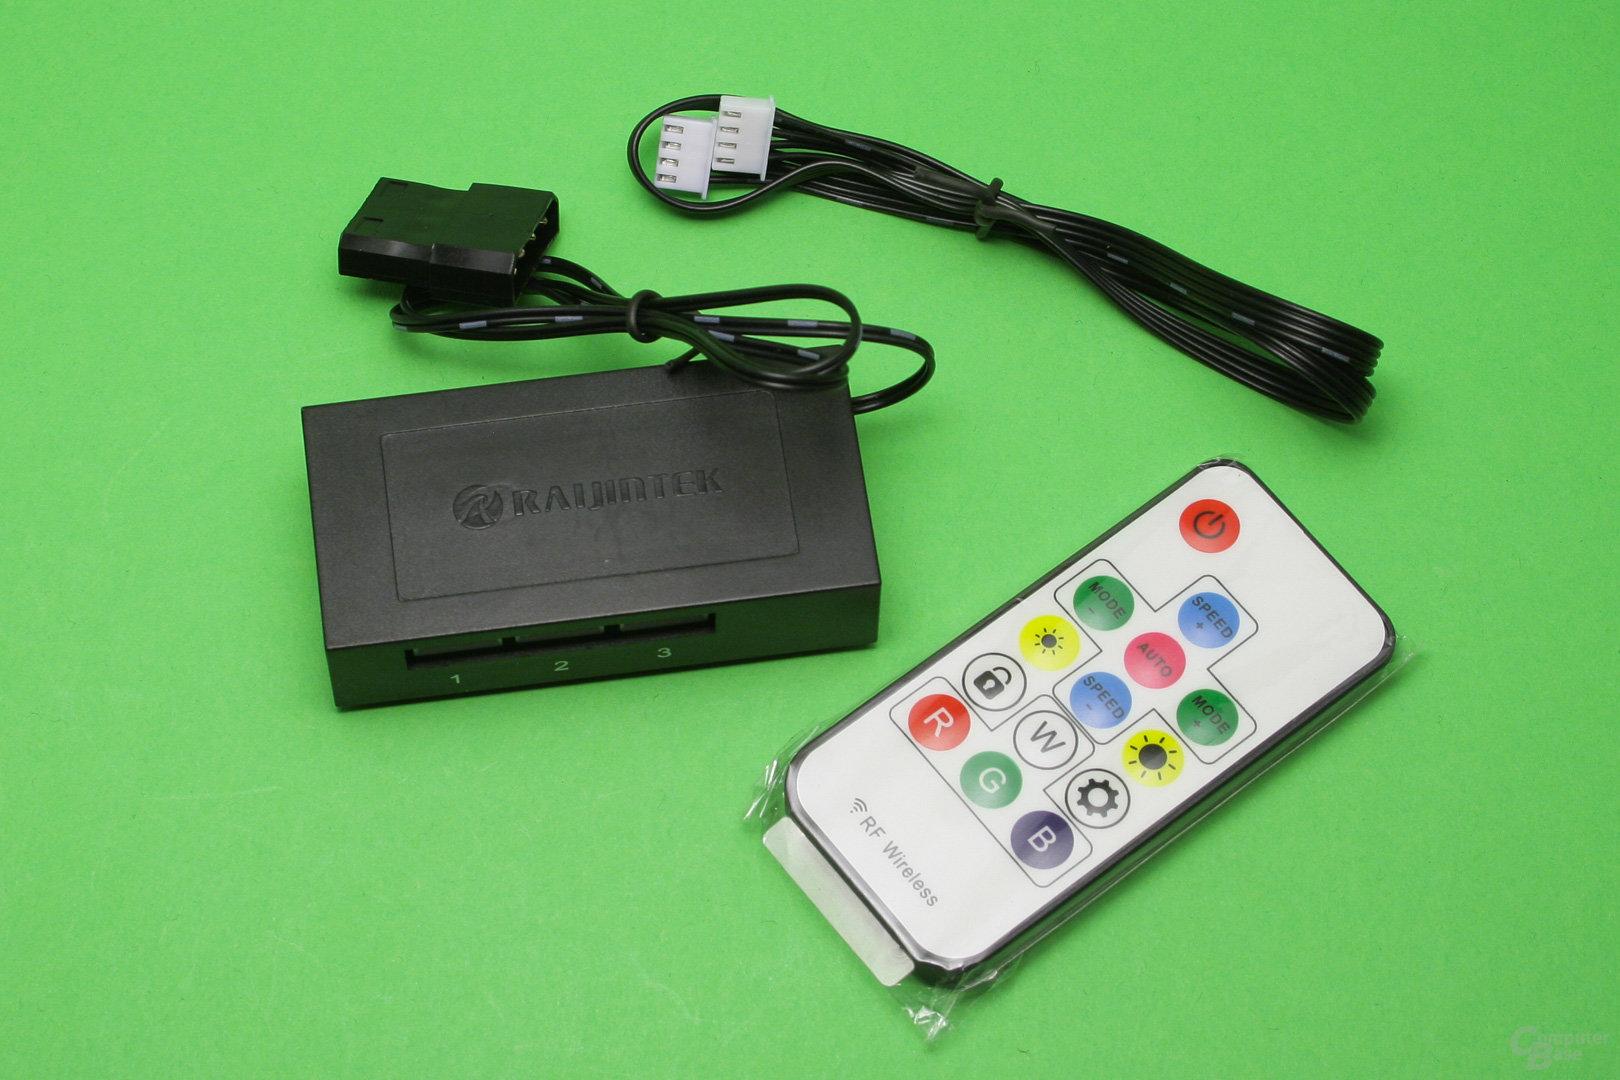 Raijintek Orcus 240: Equipment zur LED-Steuerung